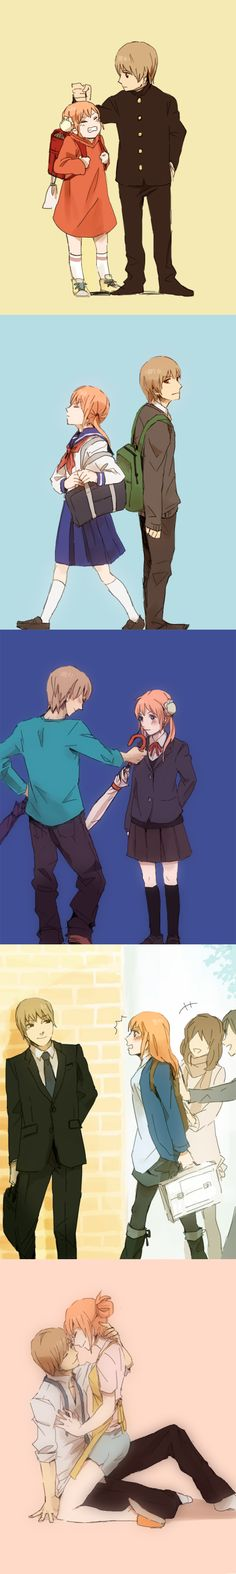 Anime: Gintama Personagens: Okita Sougo e Kagura Anime Couples Drawings, Couple Drawings, Manga Anime, Anime Art, Neji E Tenten, Gintama, Okikagu, Another Anime, Shoujo